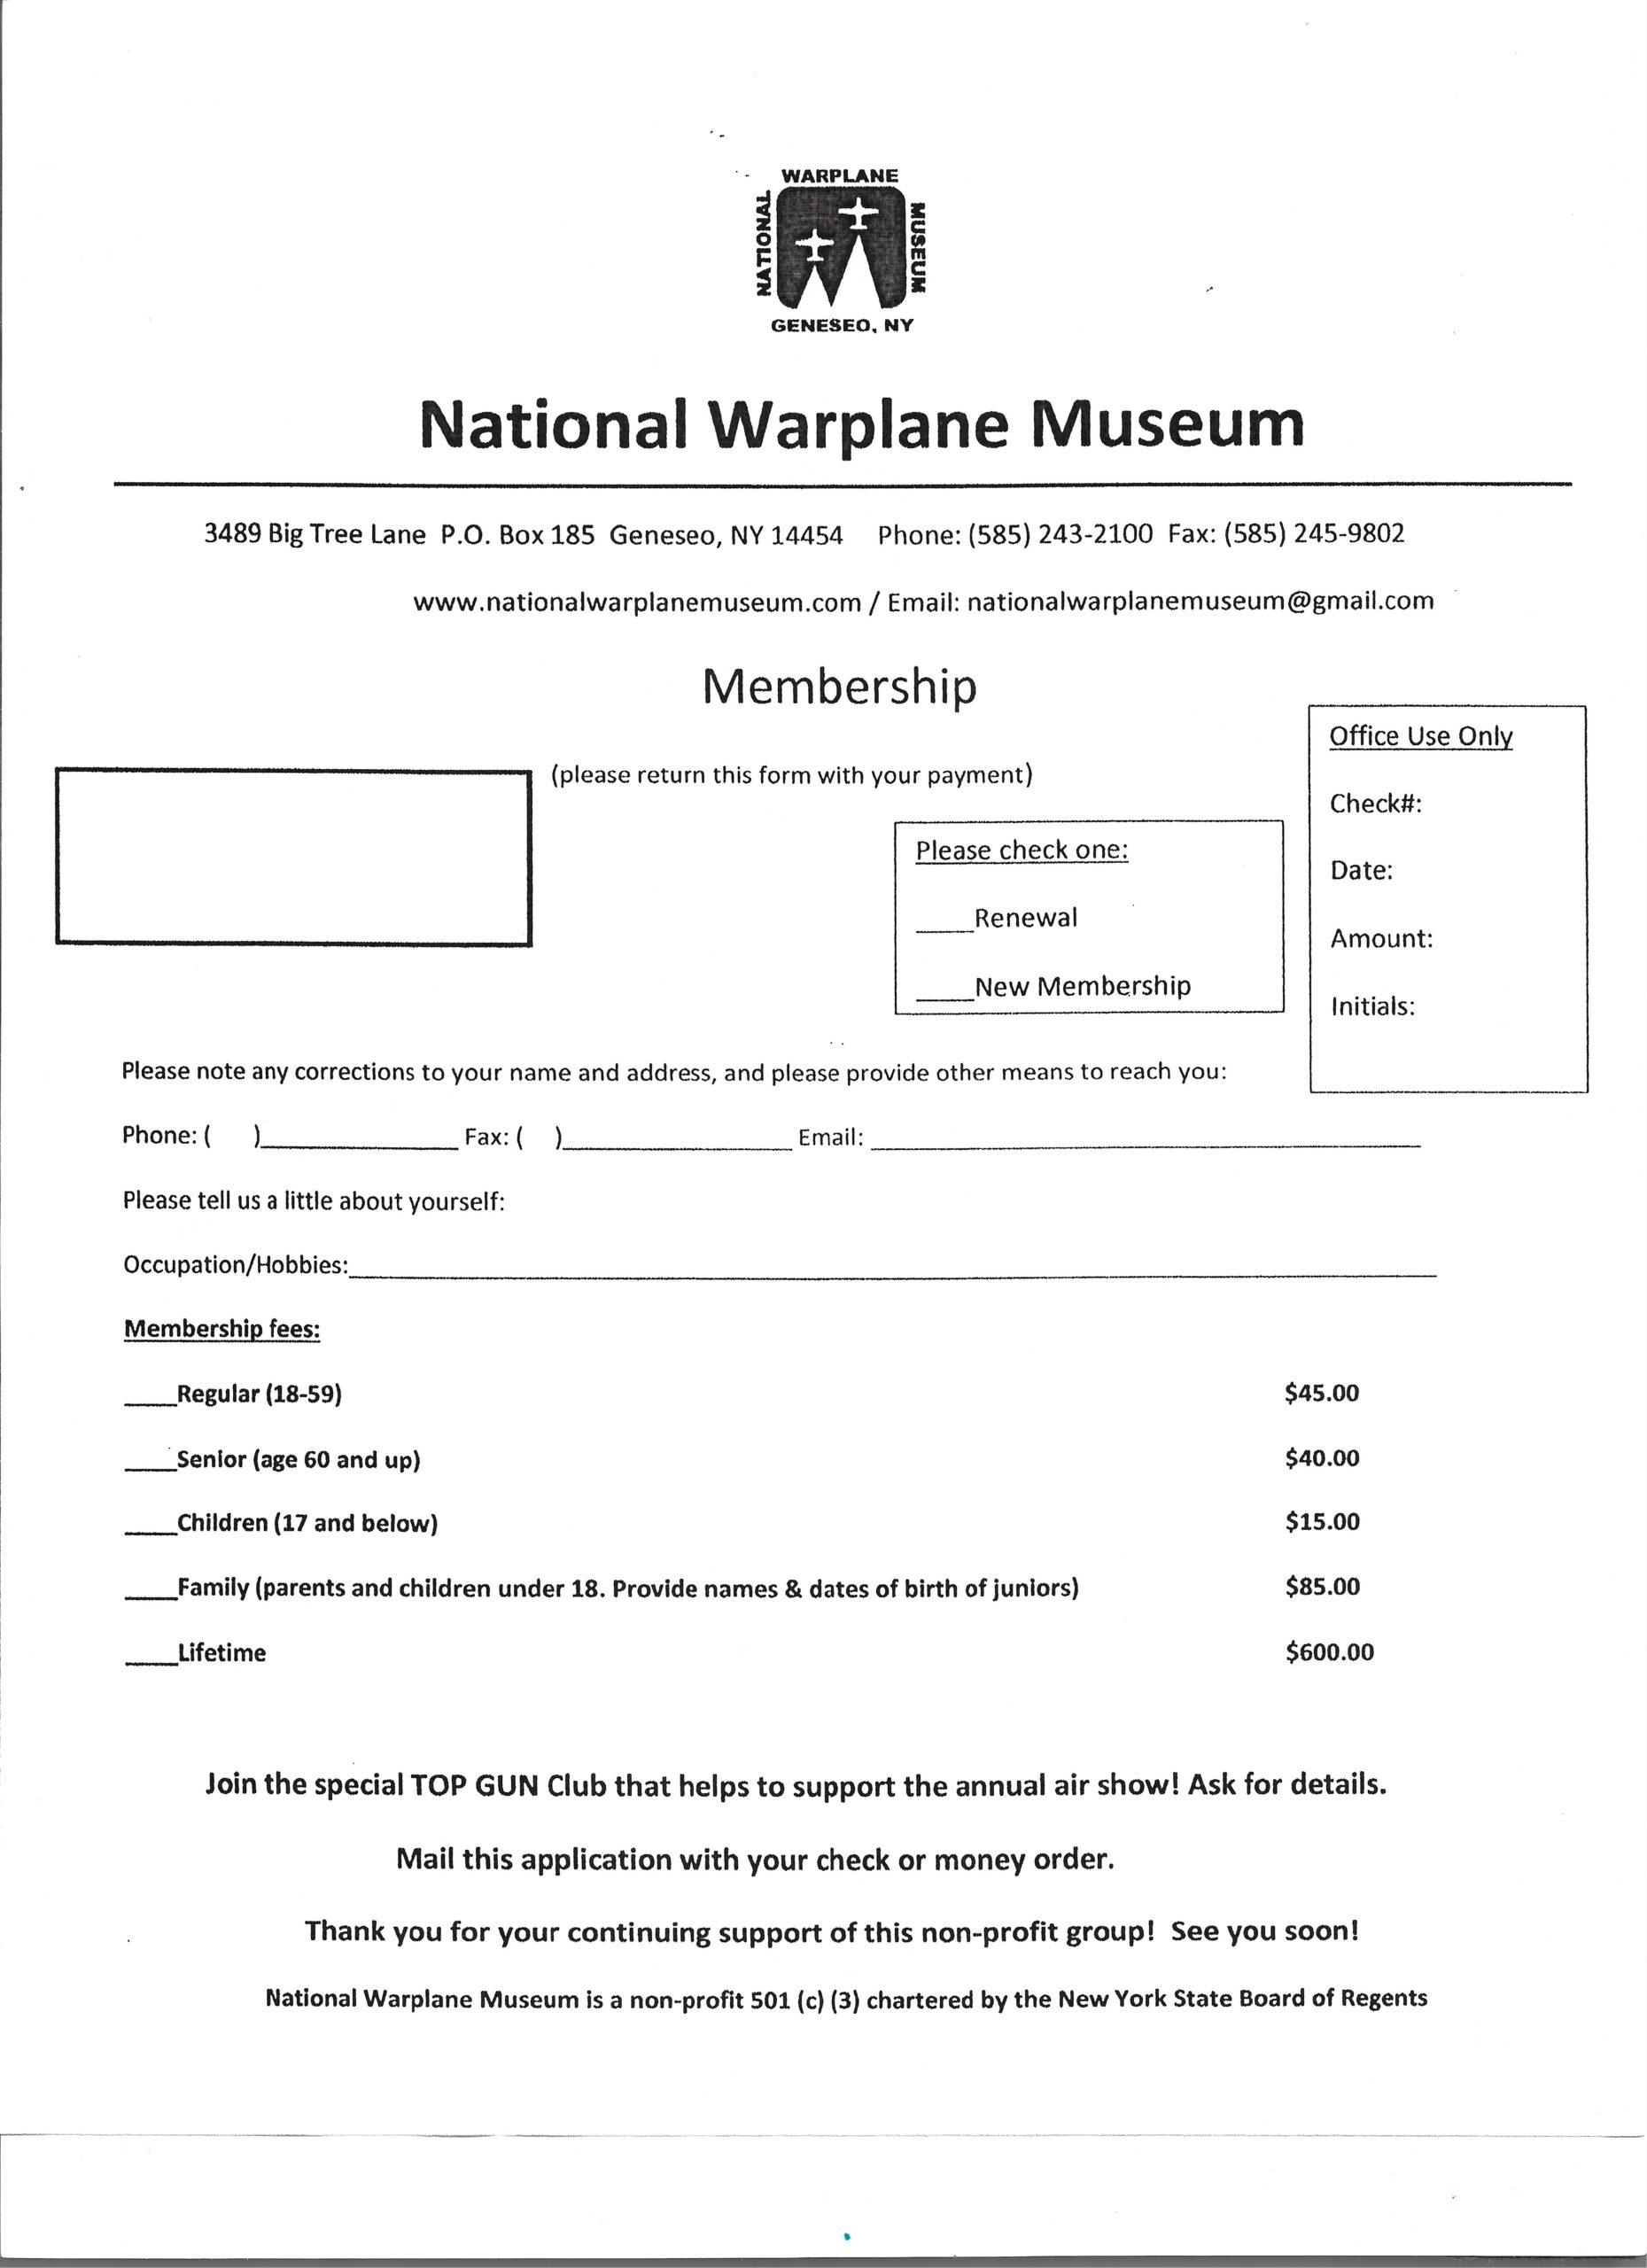 NWM Membership App